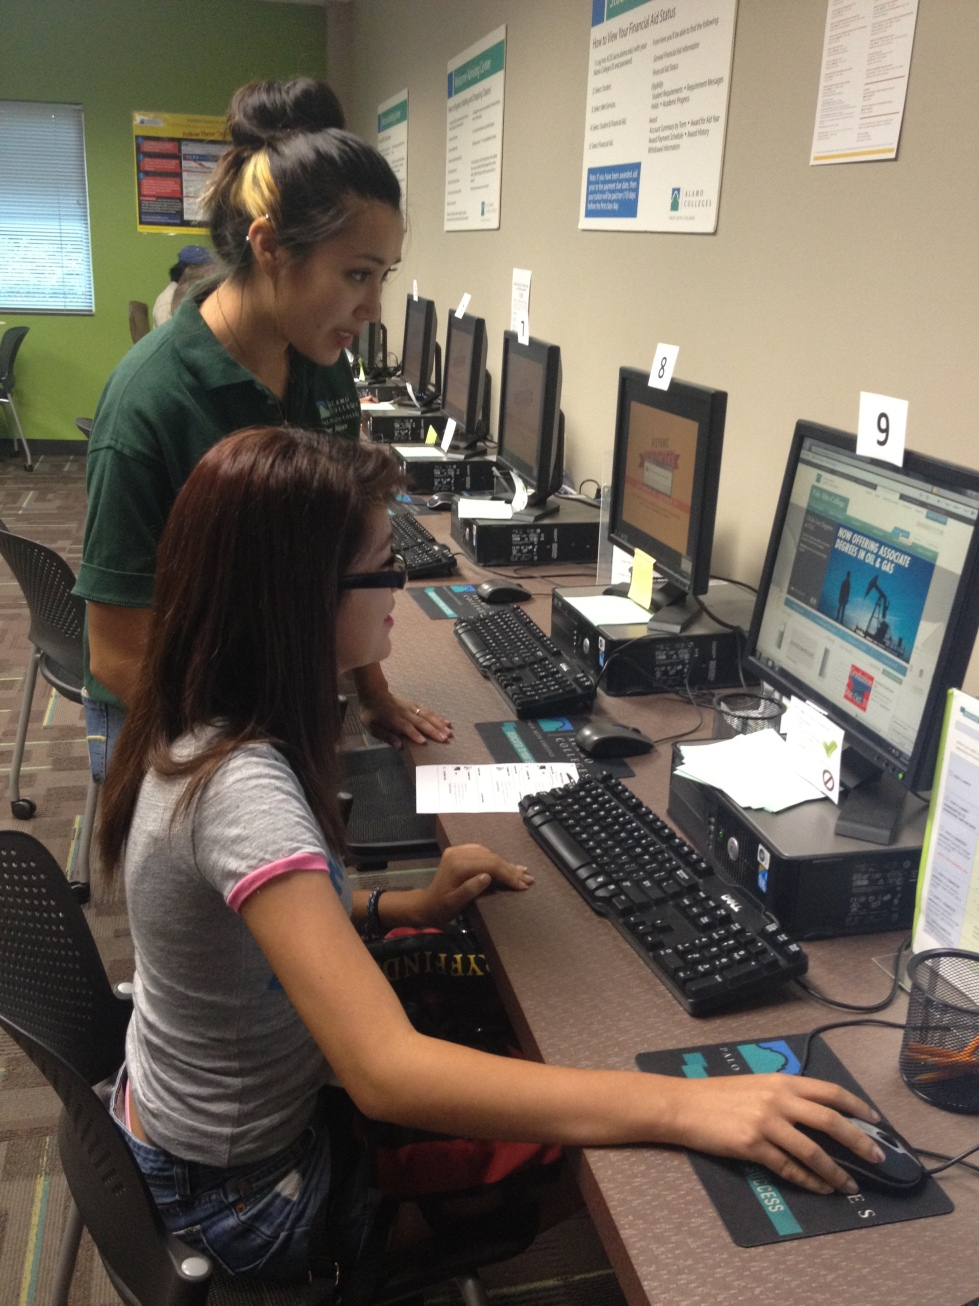 Photo of Palo Alto College Peer Adviser assisting student.